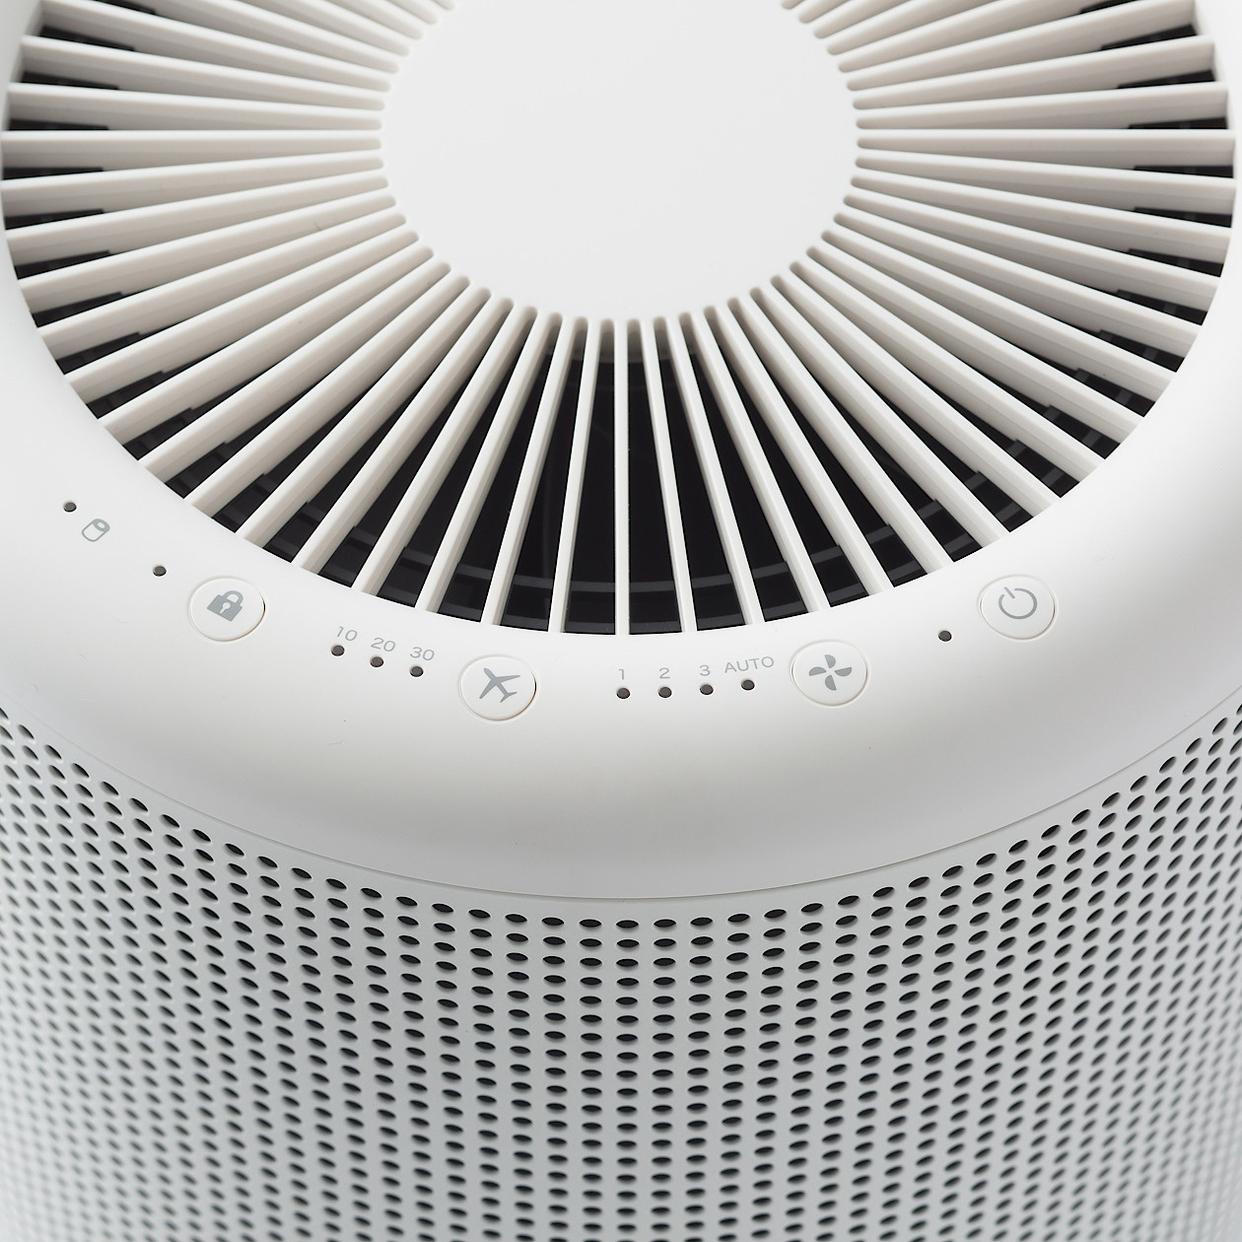 無印良品(MUJI) 空気清浄機 MJ-AP1の商品画像8